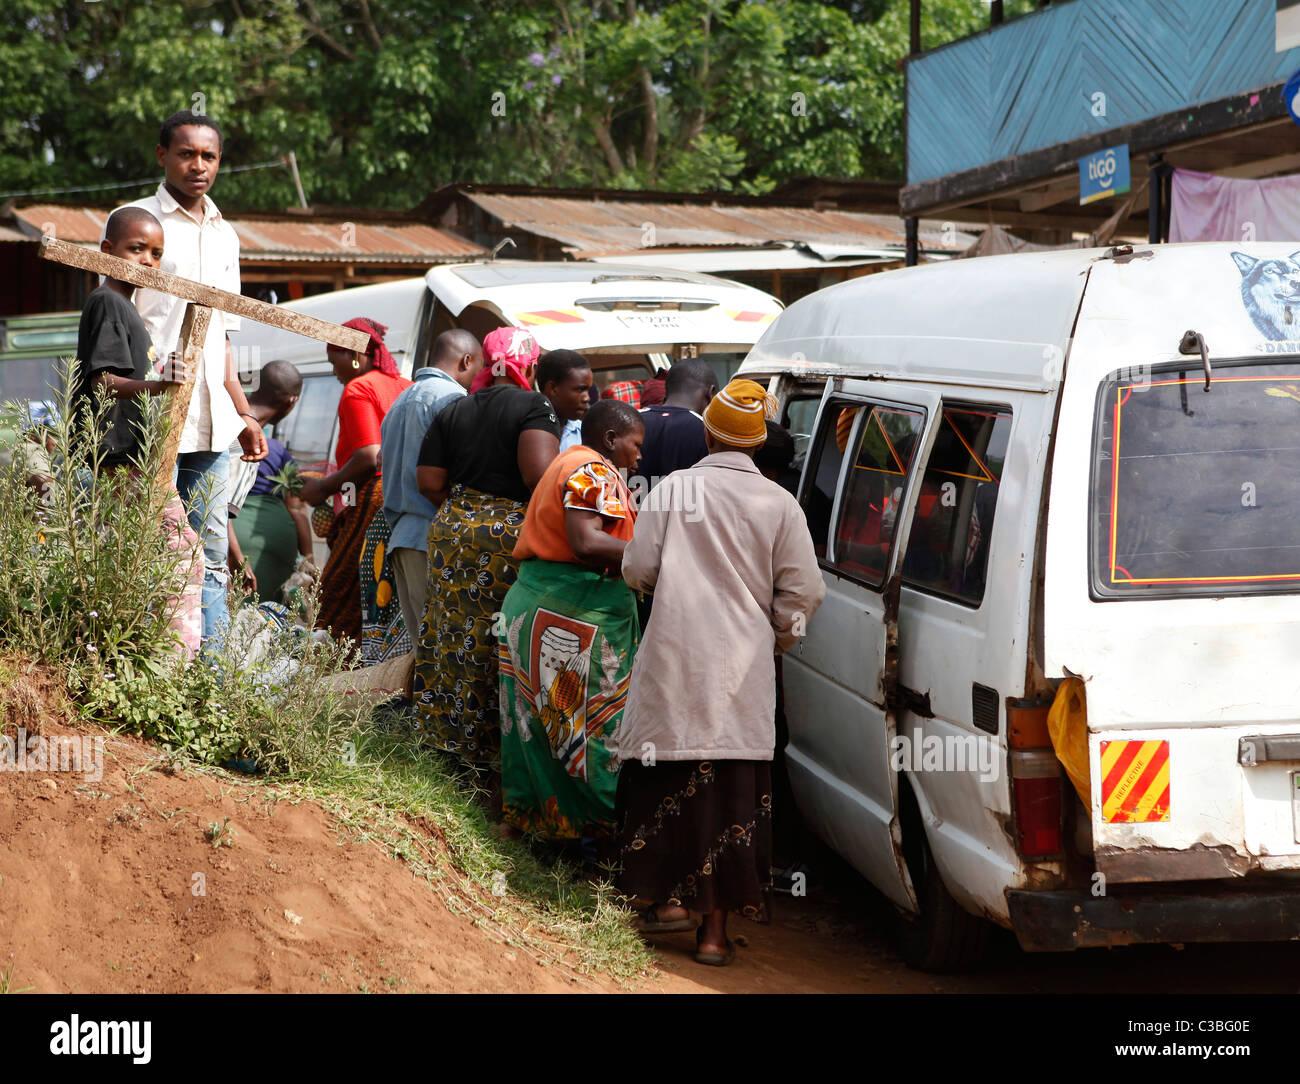 Minibus service in Marangu village, Kilimanjaro National Park, Tanzania, East Africa, Africa - Stock Image